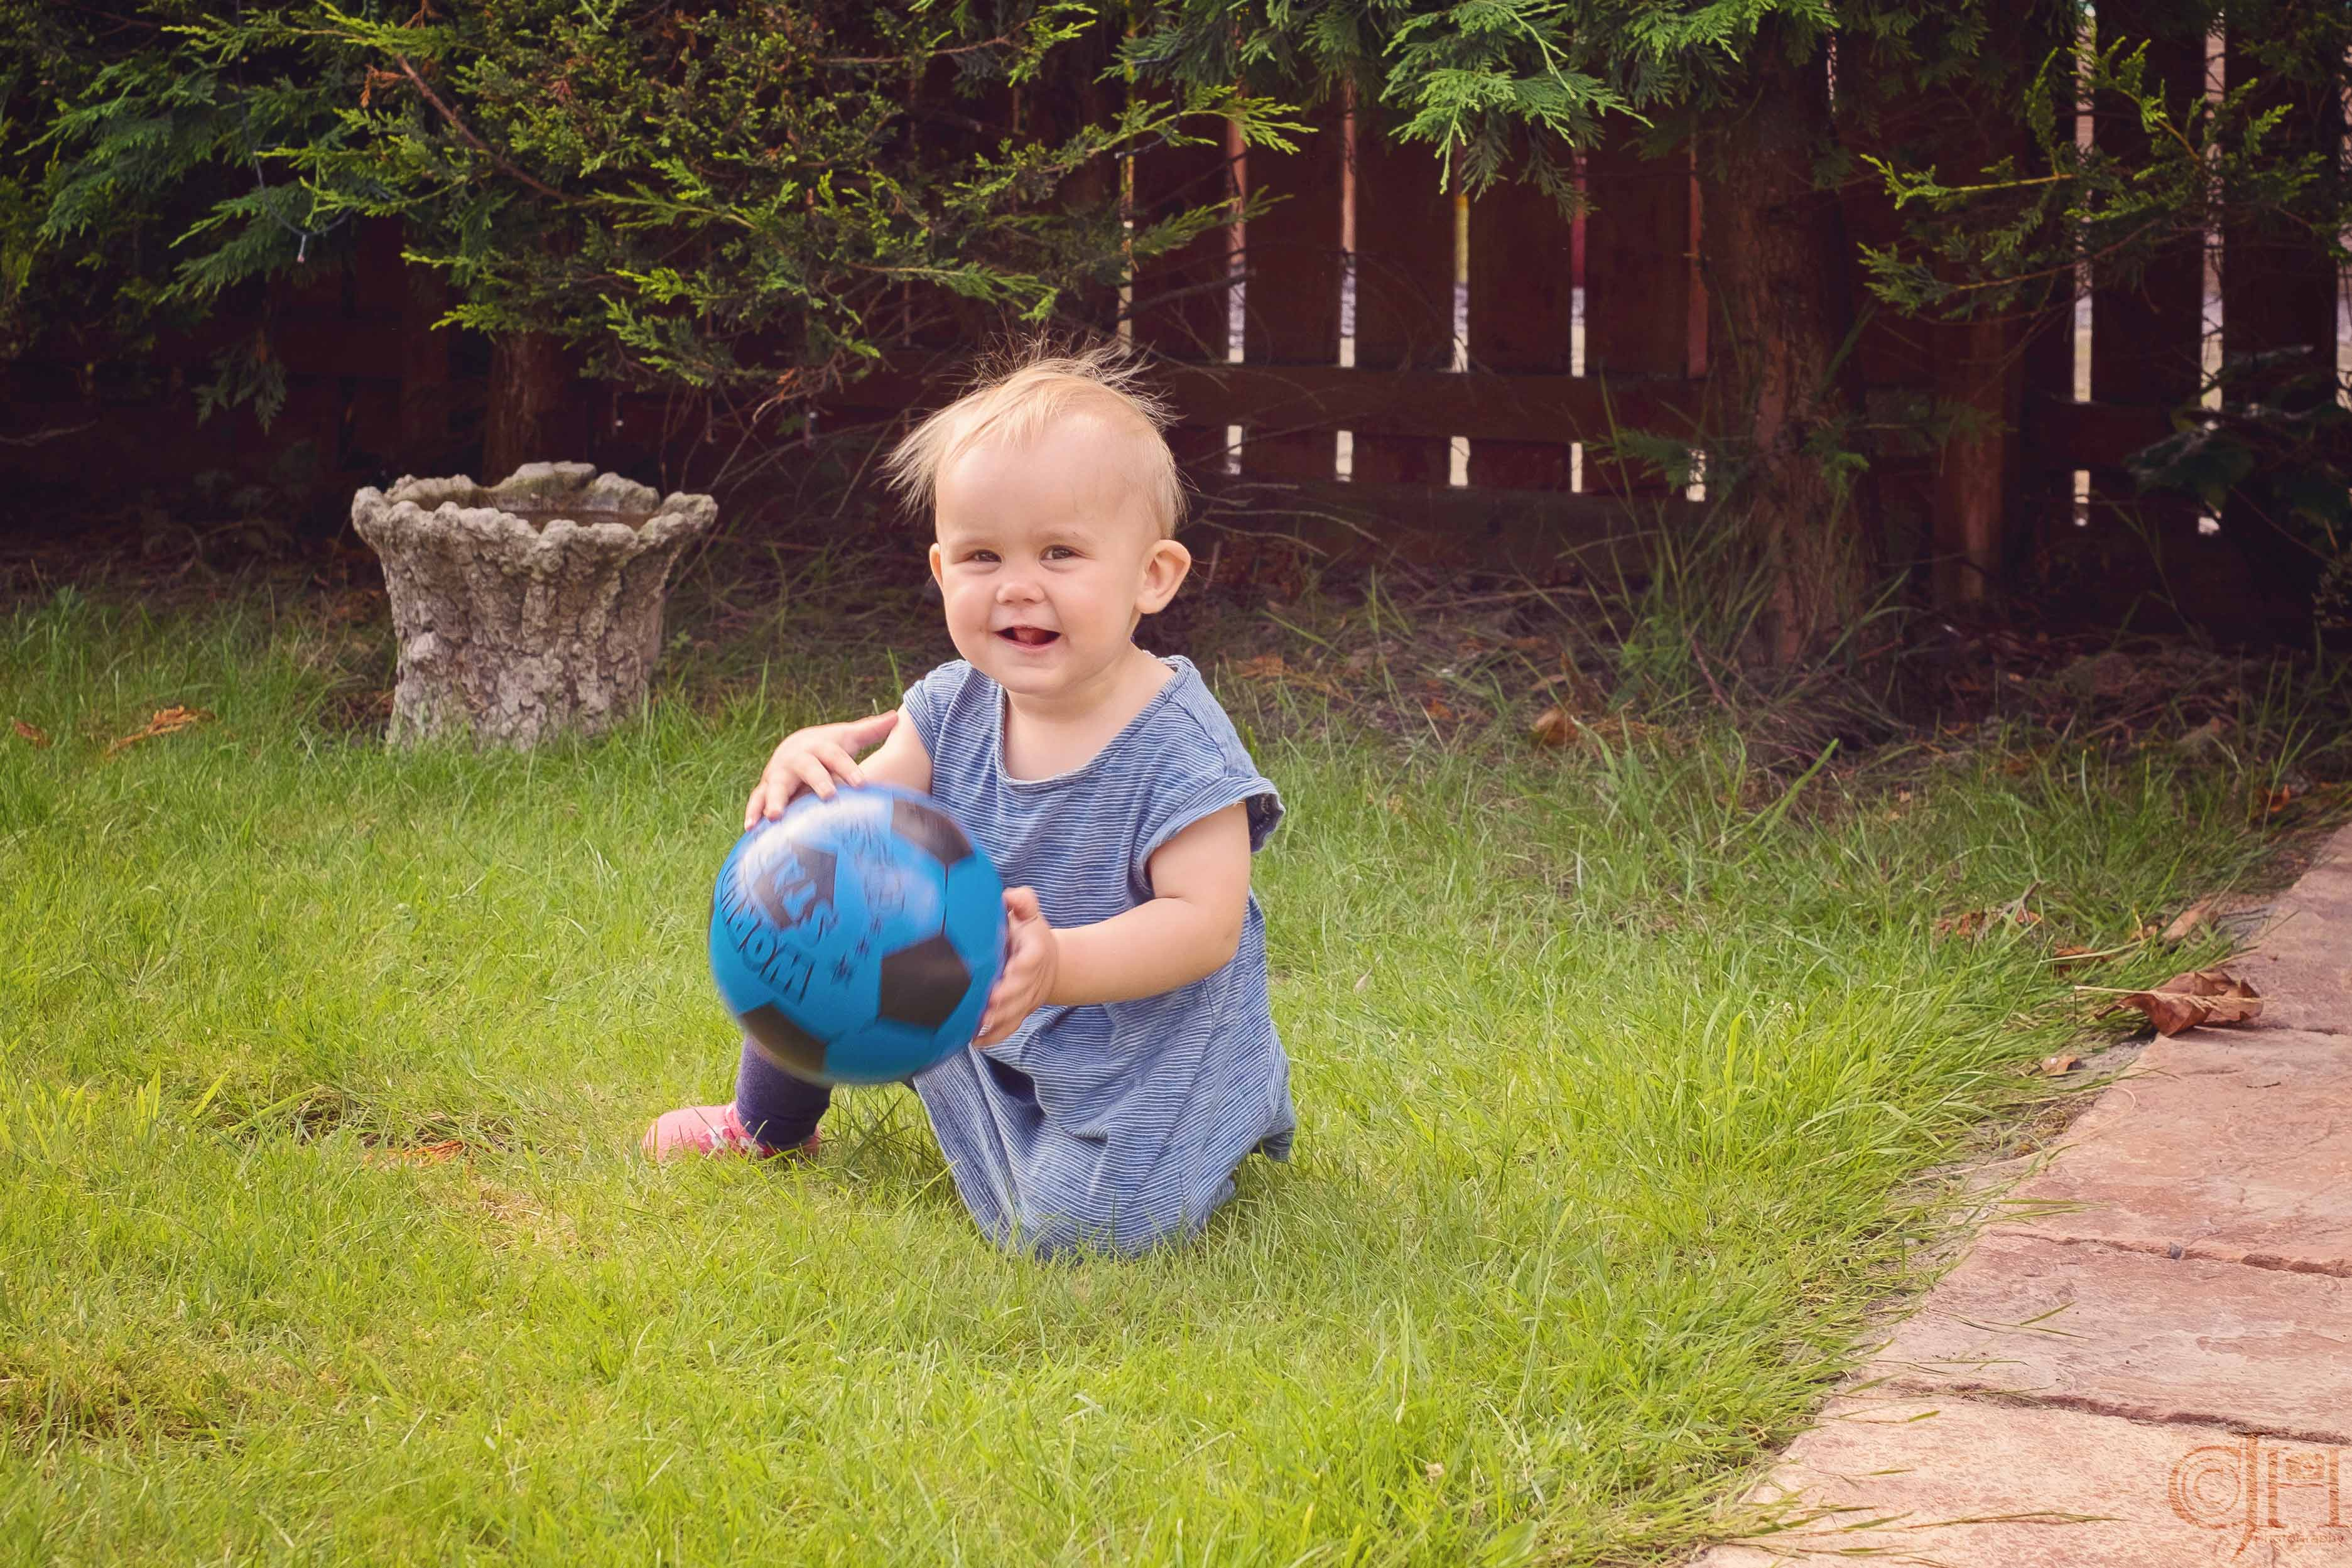 Liddy the ball girl